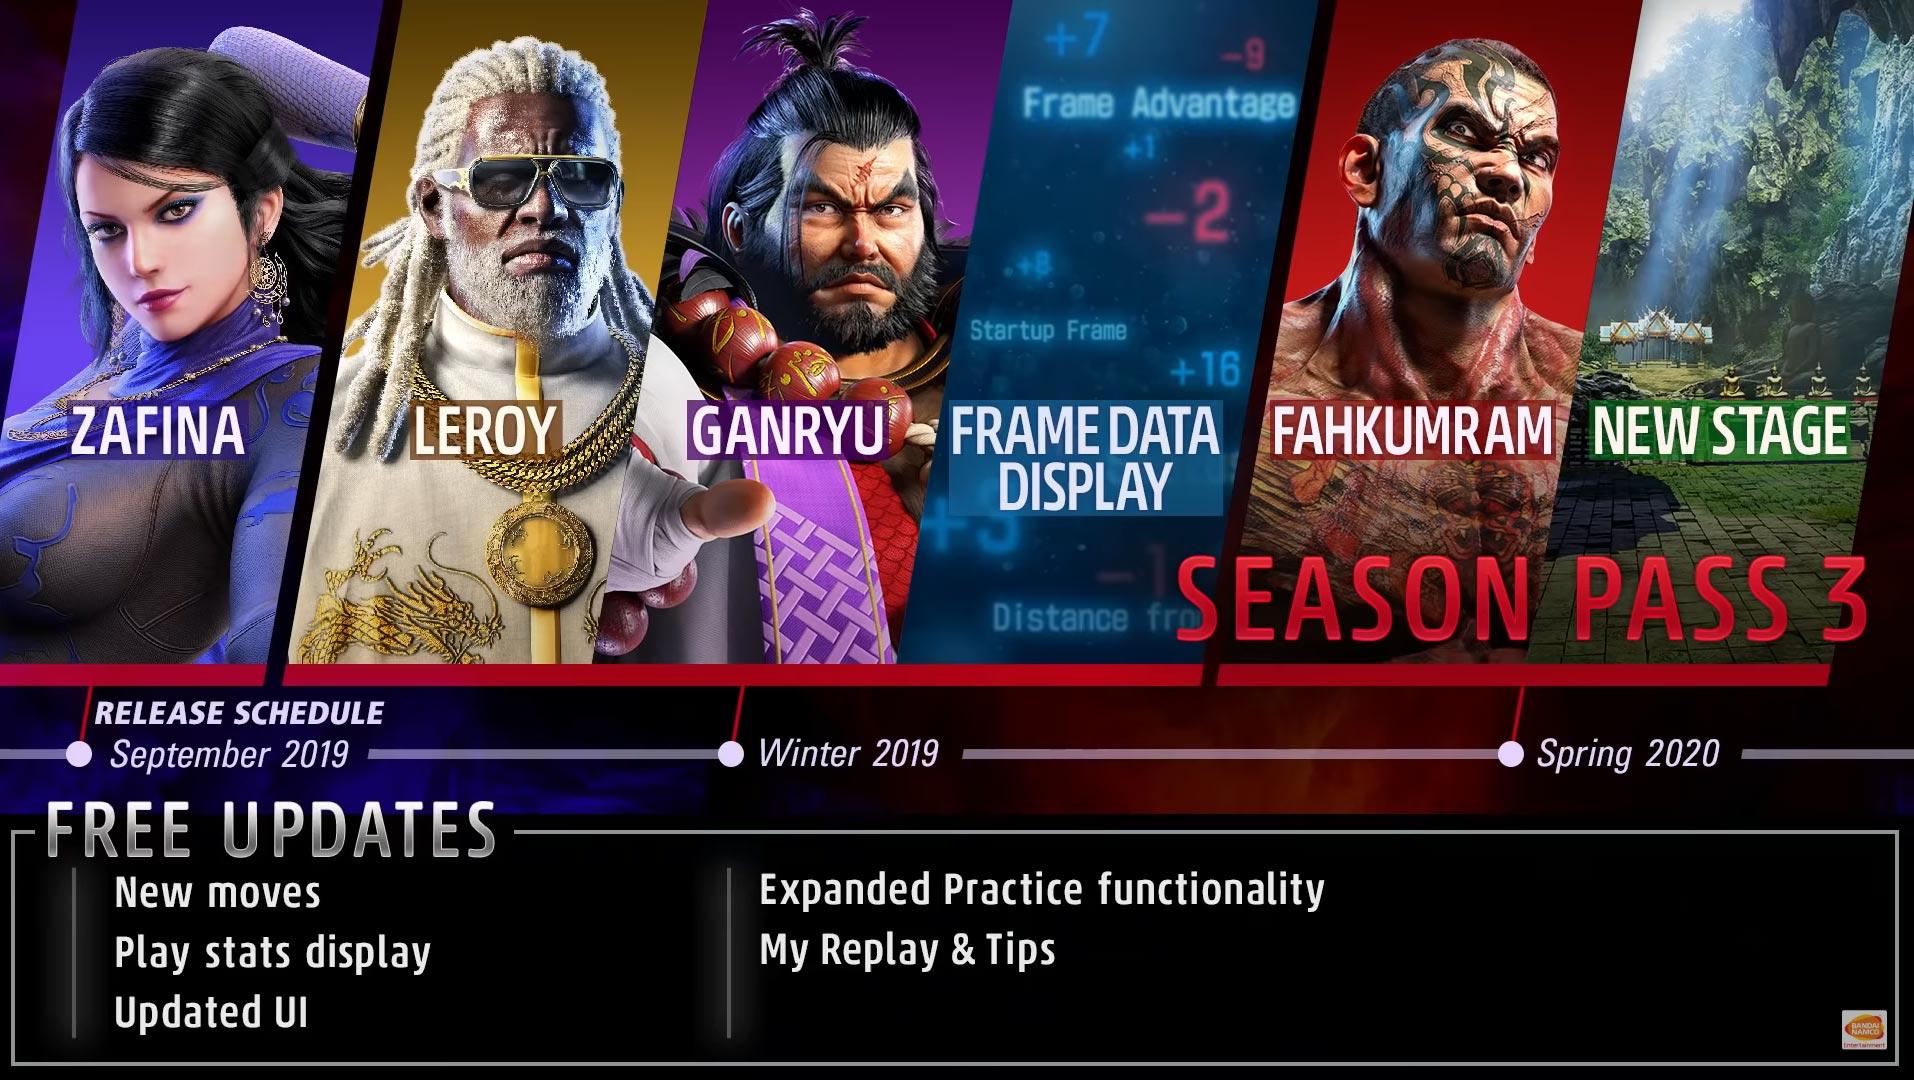 Leroy, Ganryu, Fahkumram gallery 5 out of 15 image gallery